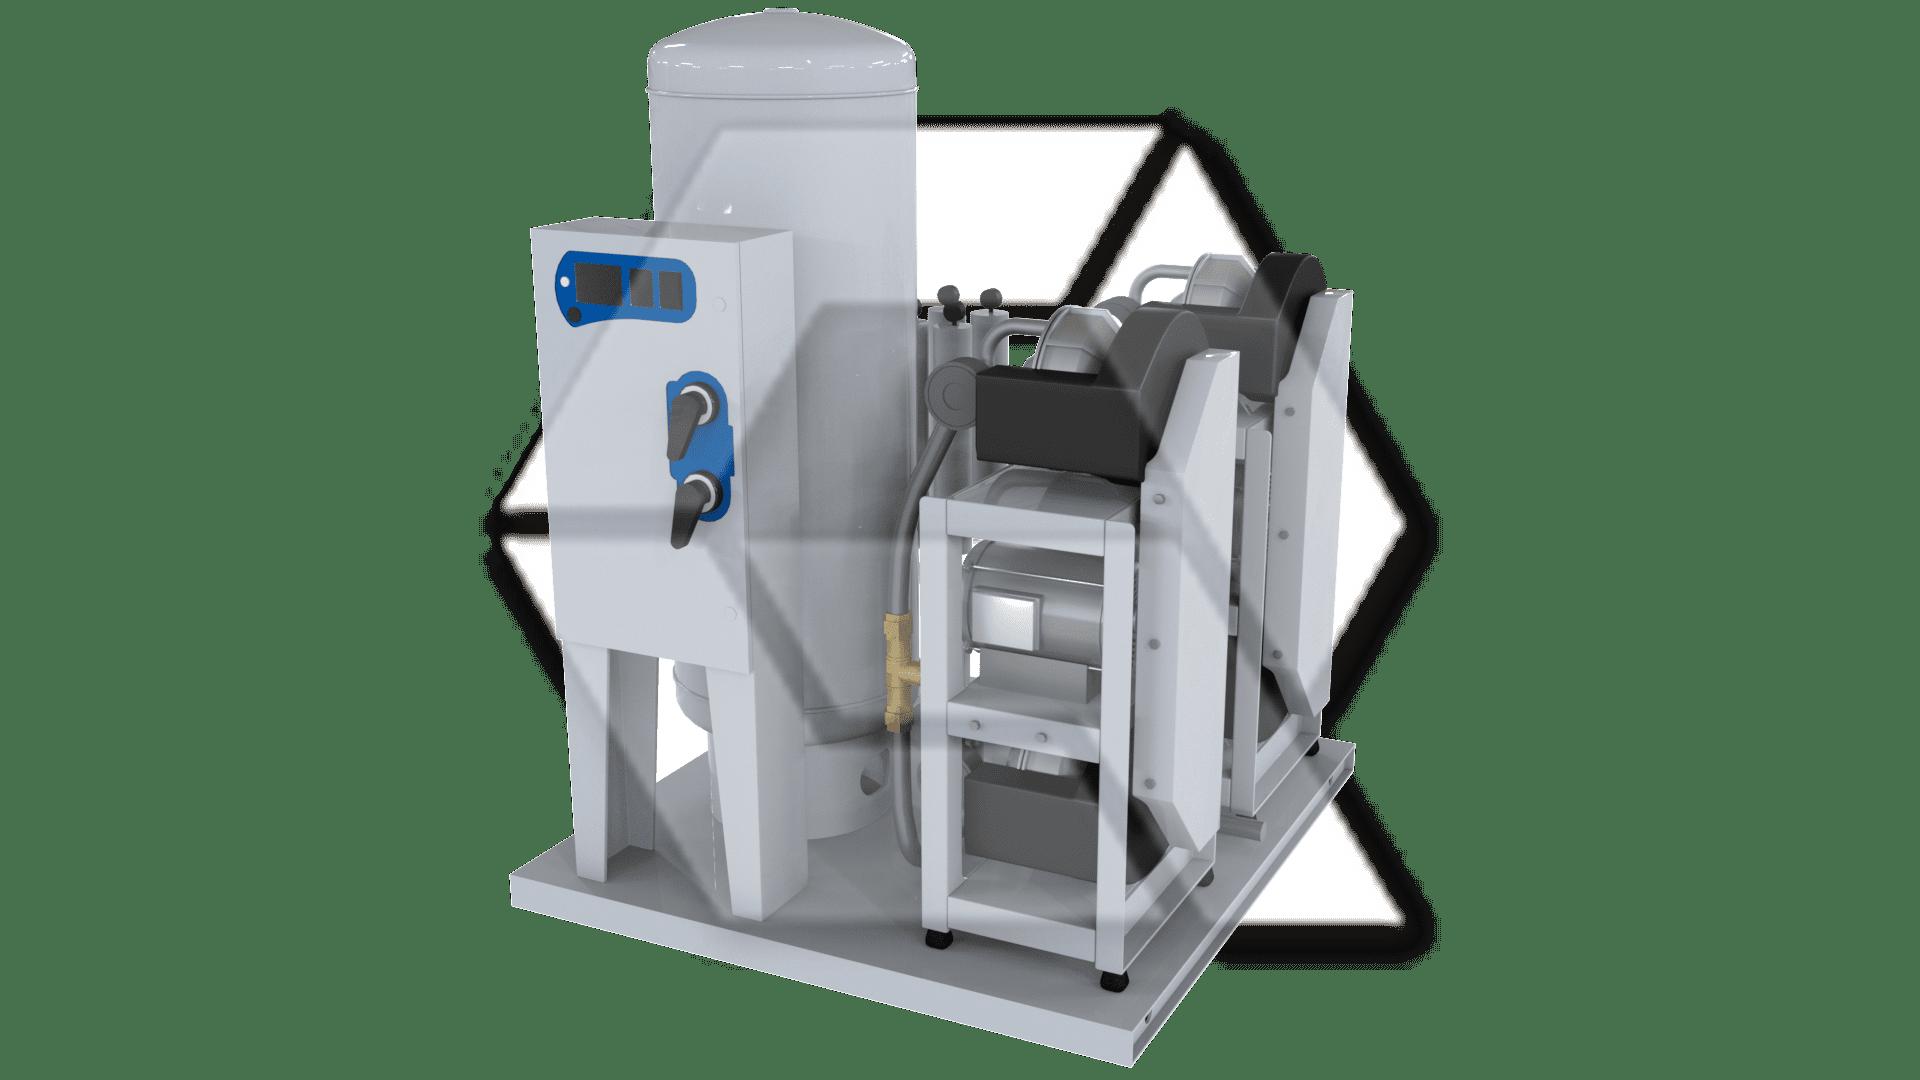 Beacon Medaes Compressor 10 HP Duplex